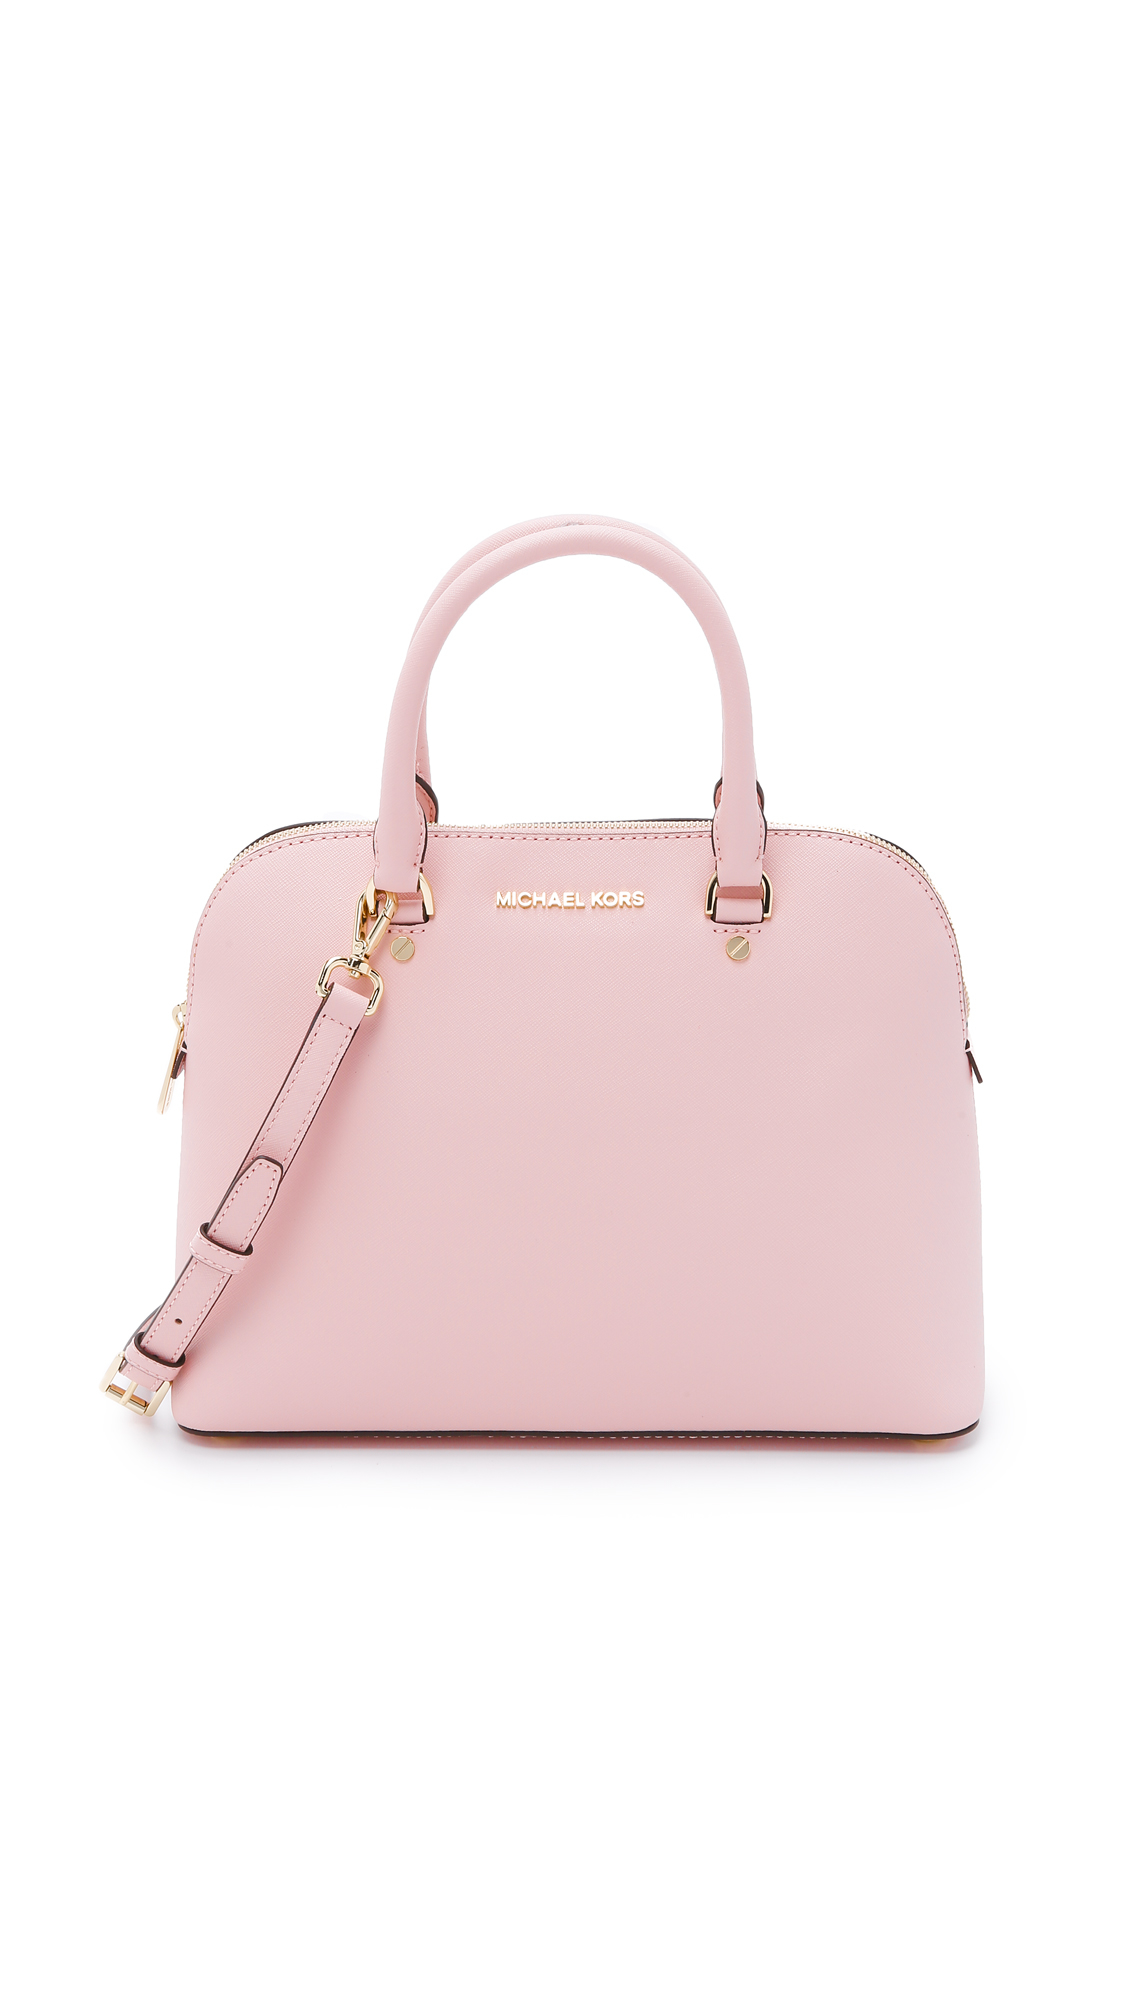 6303e0b0d6c4 ... discount michael michael kors cindy satchel blossom in pink lyst d54ba  8acdd